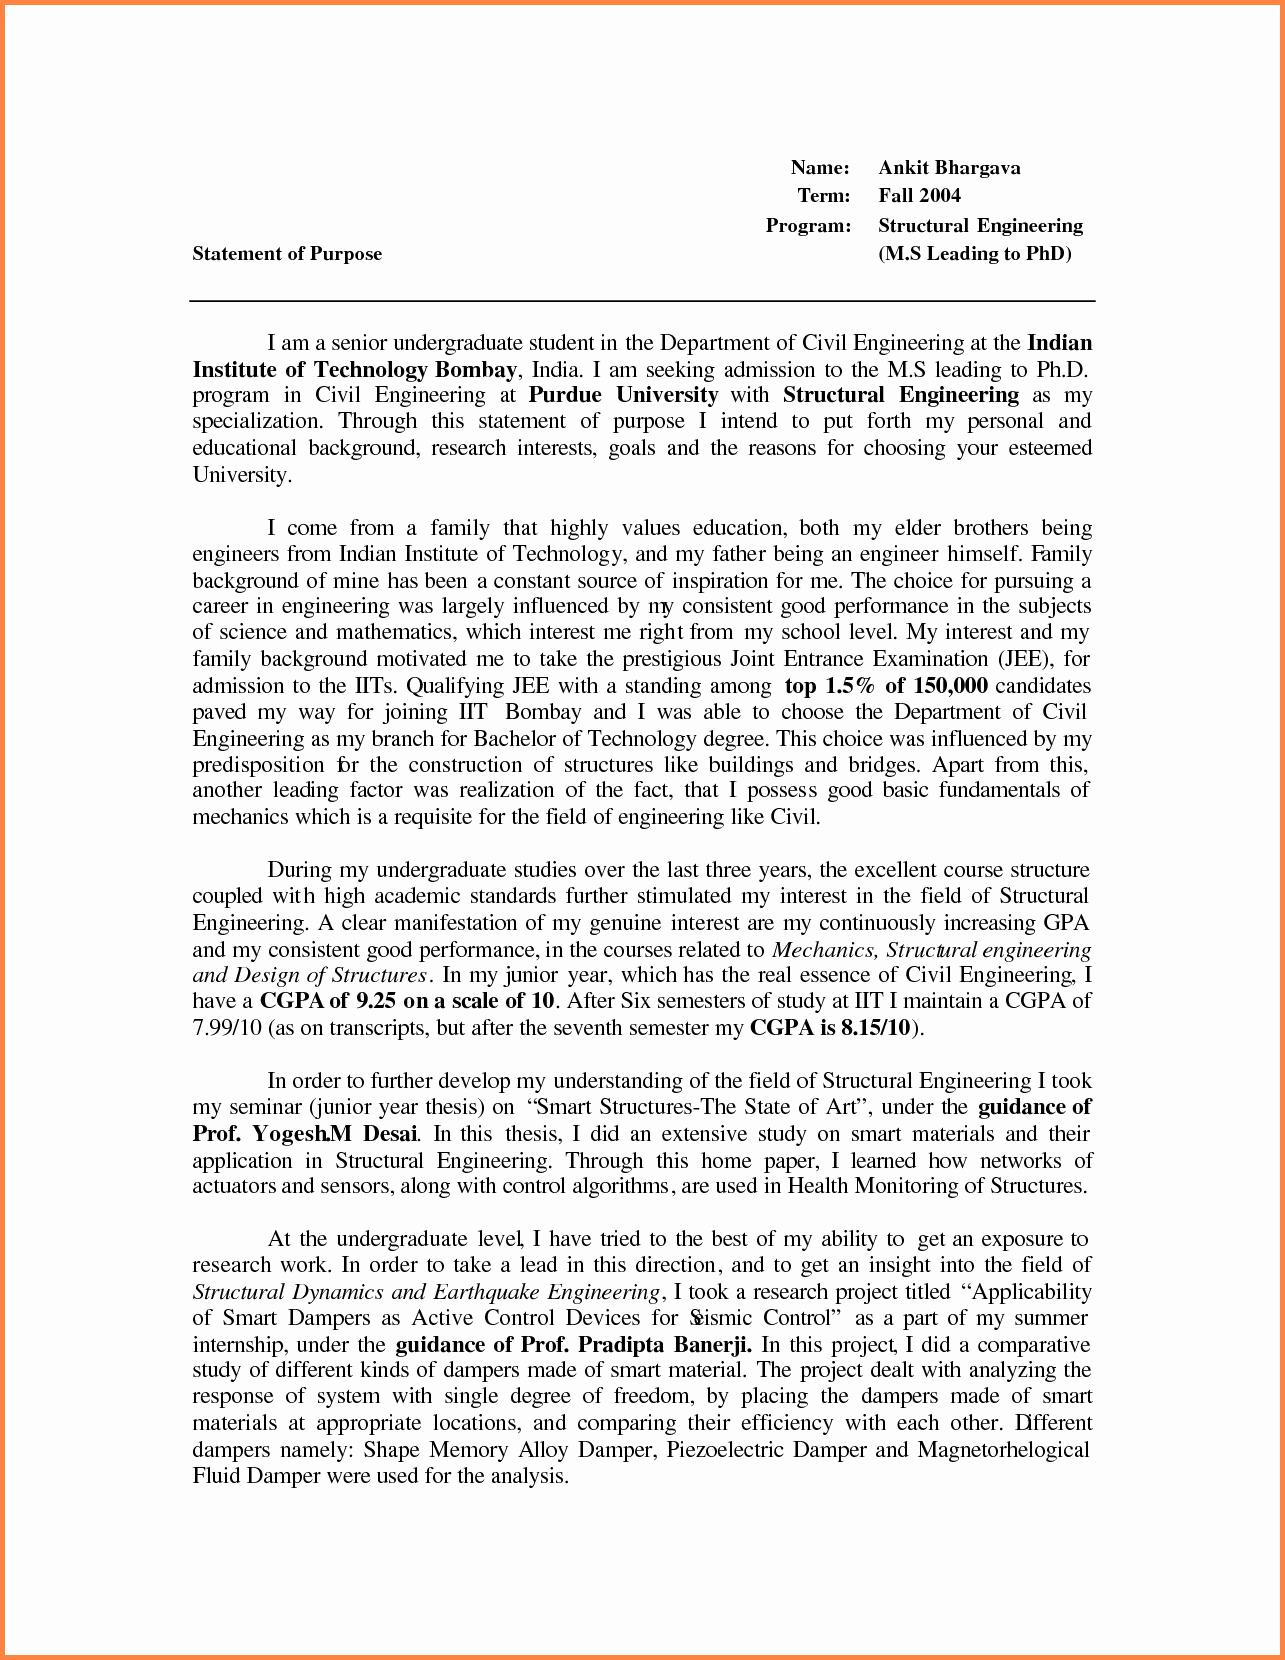 Sample Letters Of Intent Grad School New Graduate School Letter Intent Template Bunch Ideas